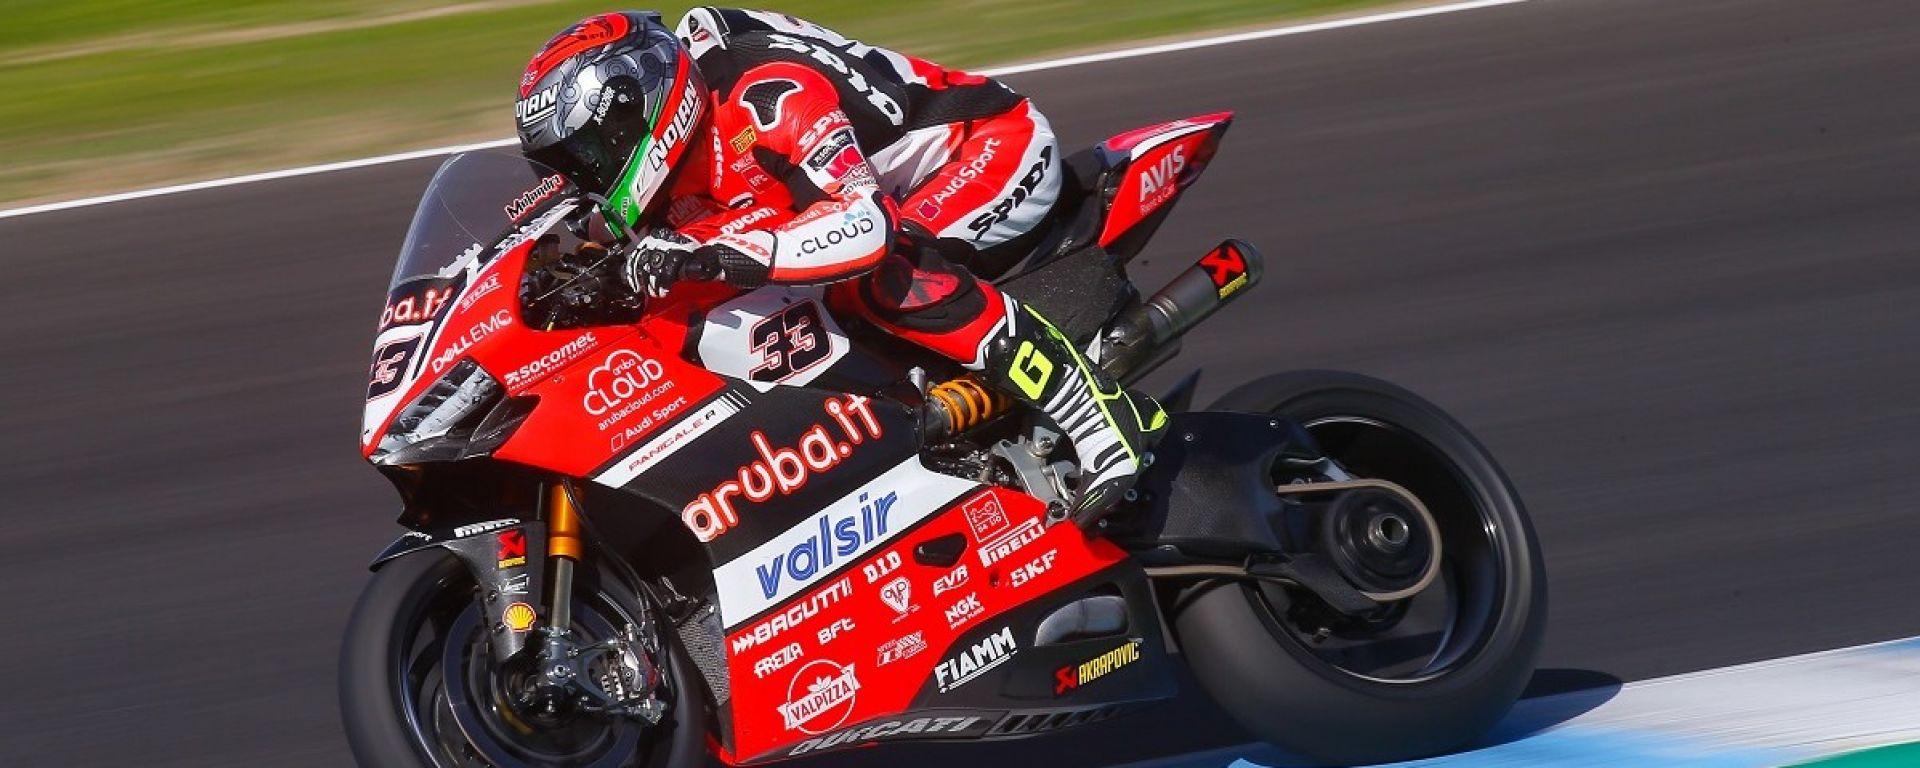 Sbk Vs Motogp | MotoGP 2017 Info, Video, Points Table